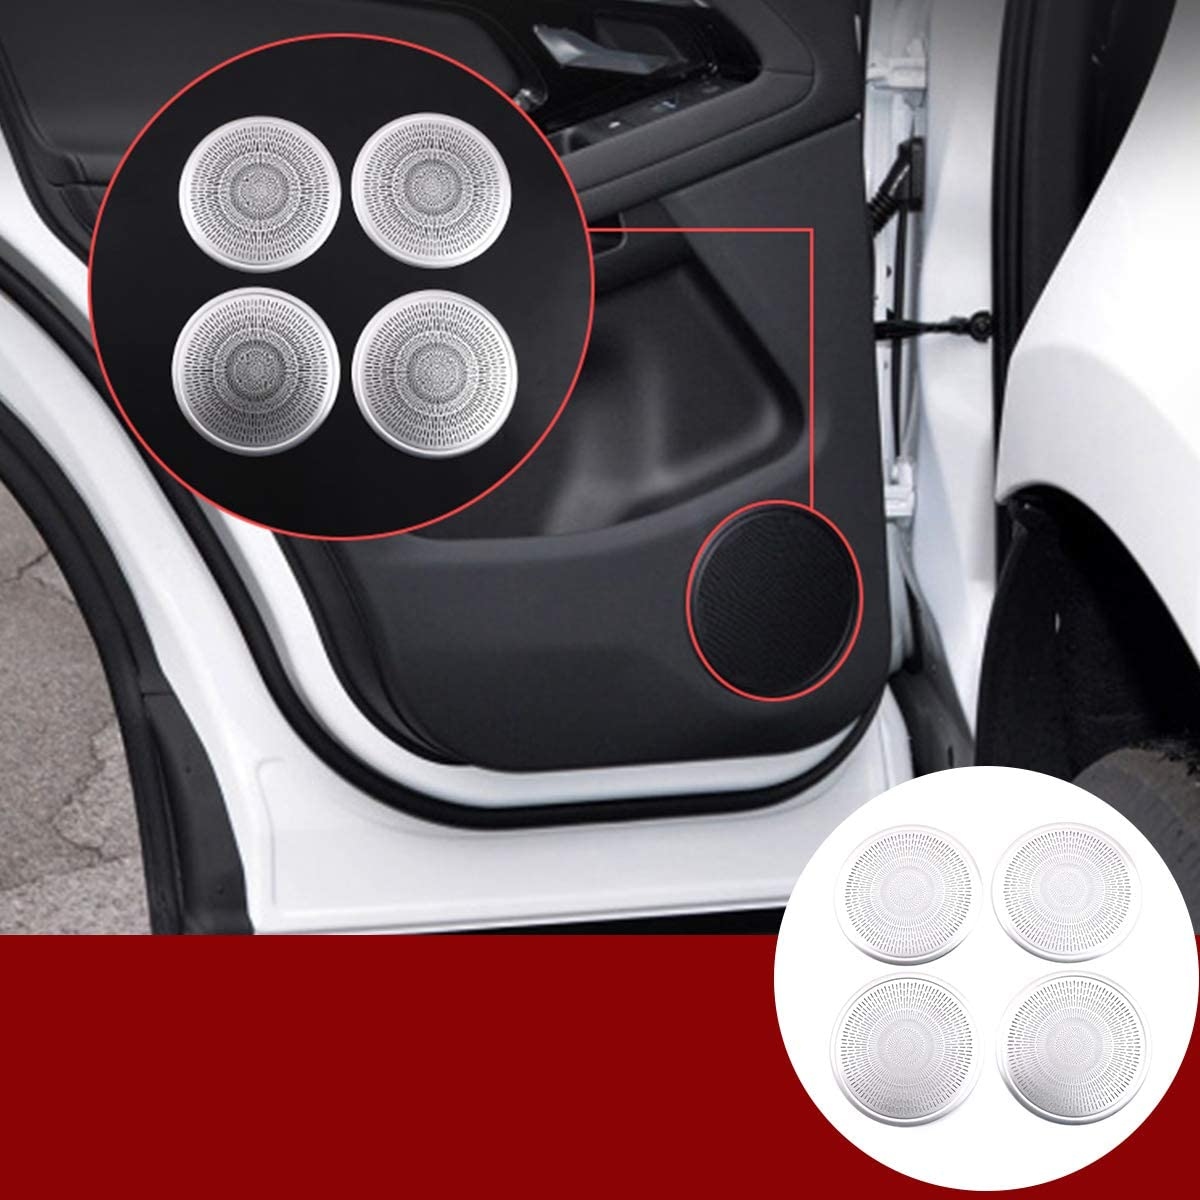 YIWANG Aluminum Alloy Car Door Tweeter Speaker Cover Trim 4pcs for Land Rover Range Rover Evoque 2019 2020 Auto Accessories